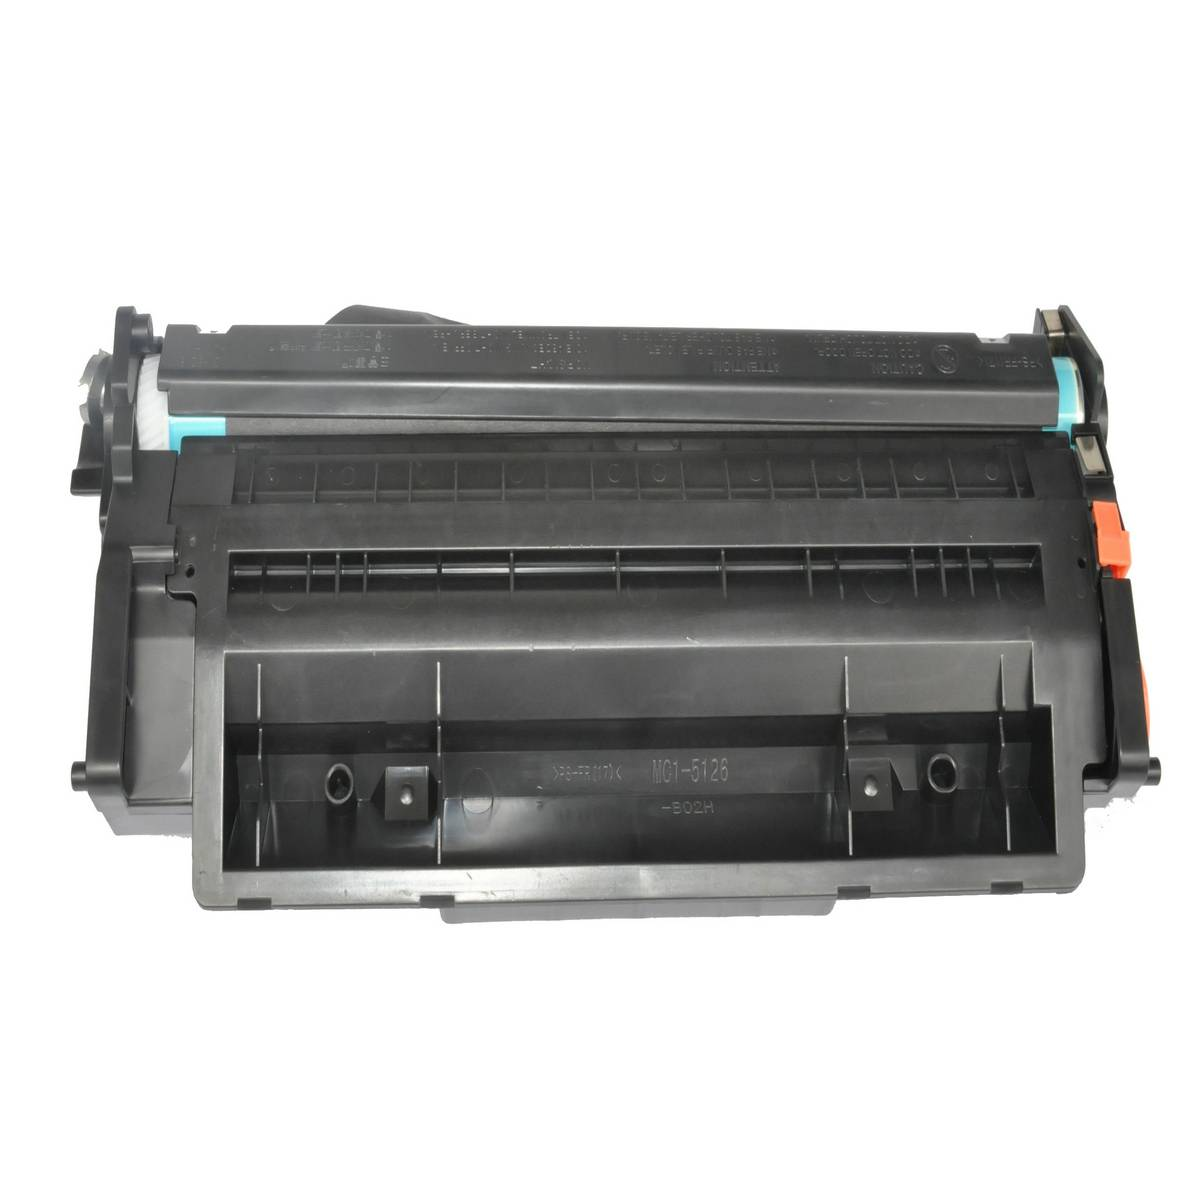 Compatible CF280A 280X CE505A 505X Toner cartridge for HP Laserjet M400/401 P2035 / 2055dn